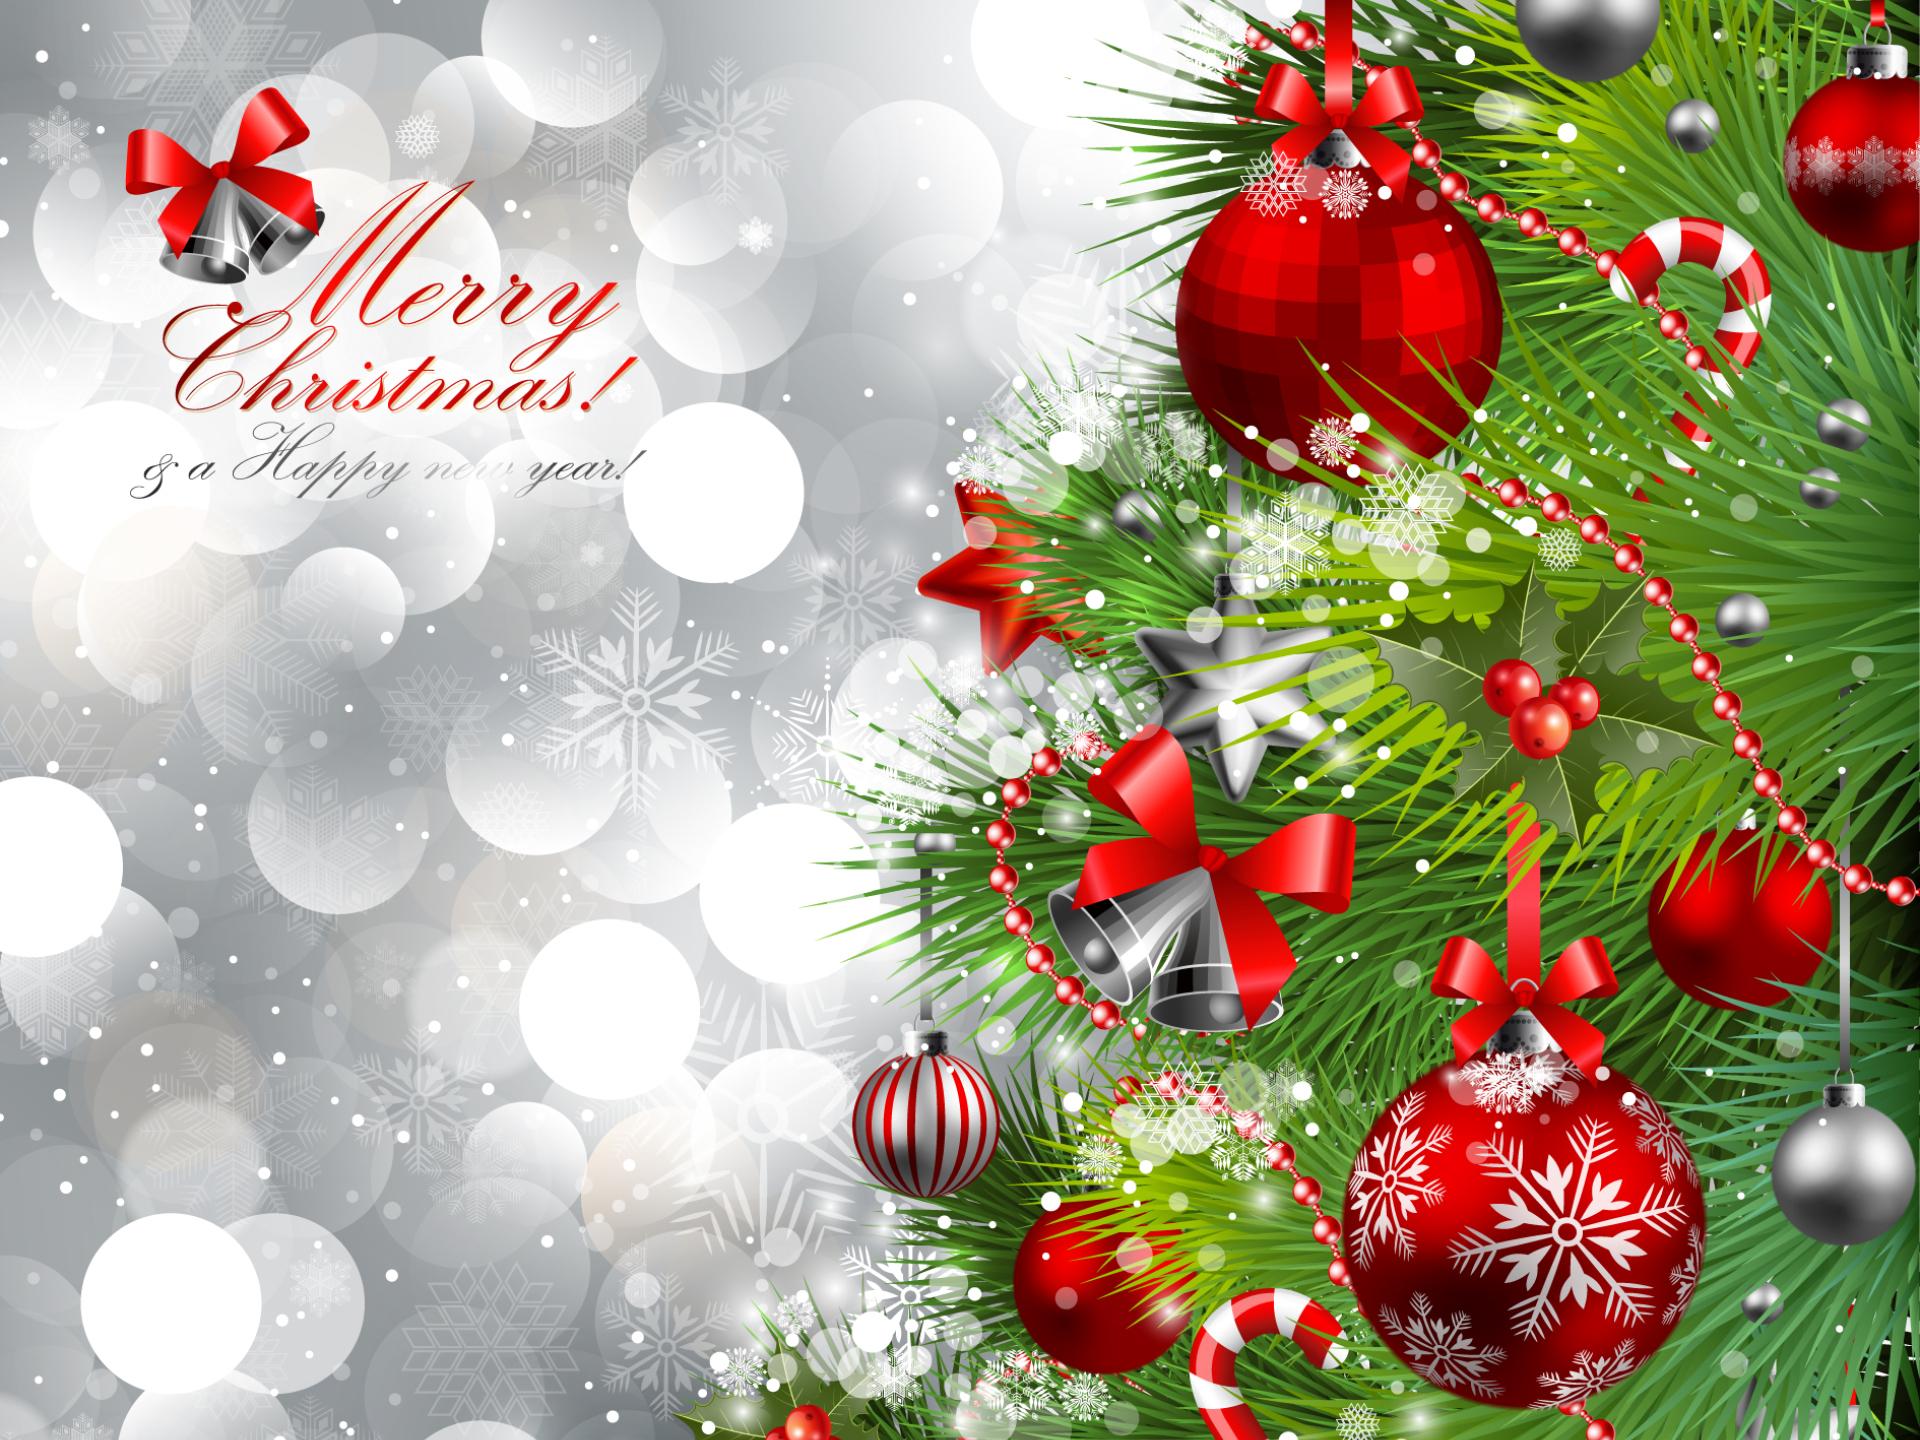 Merry Christmas - Christmas Wallpaper (32793659) - Fanpop